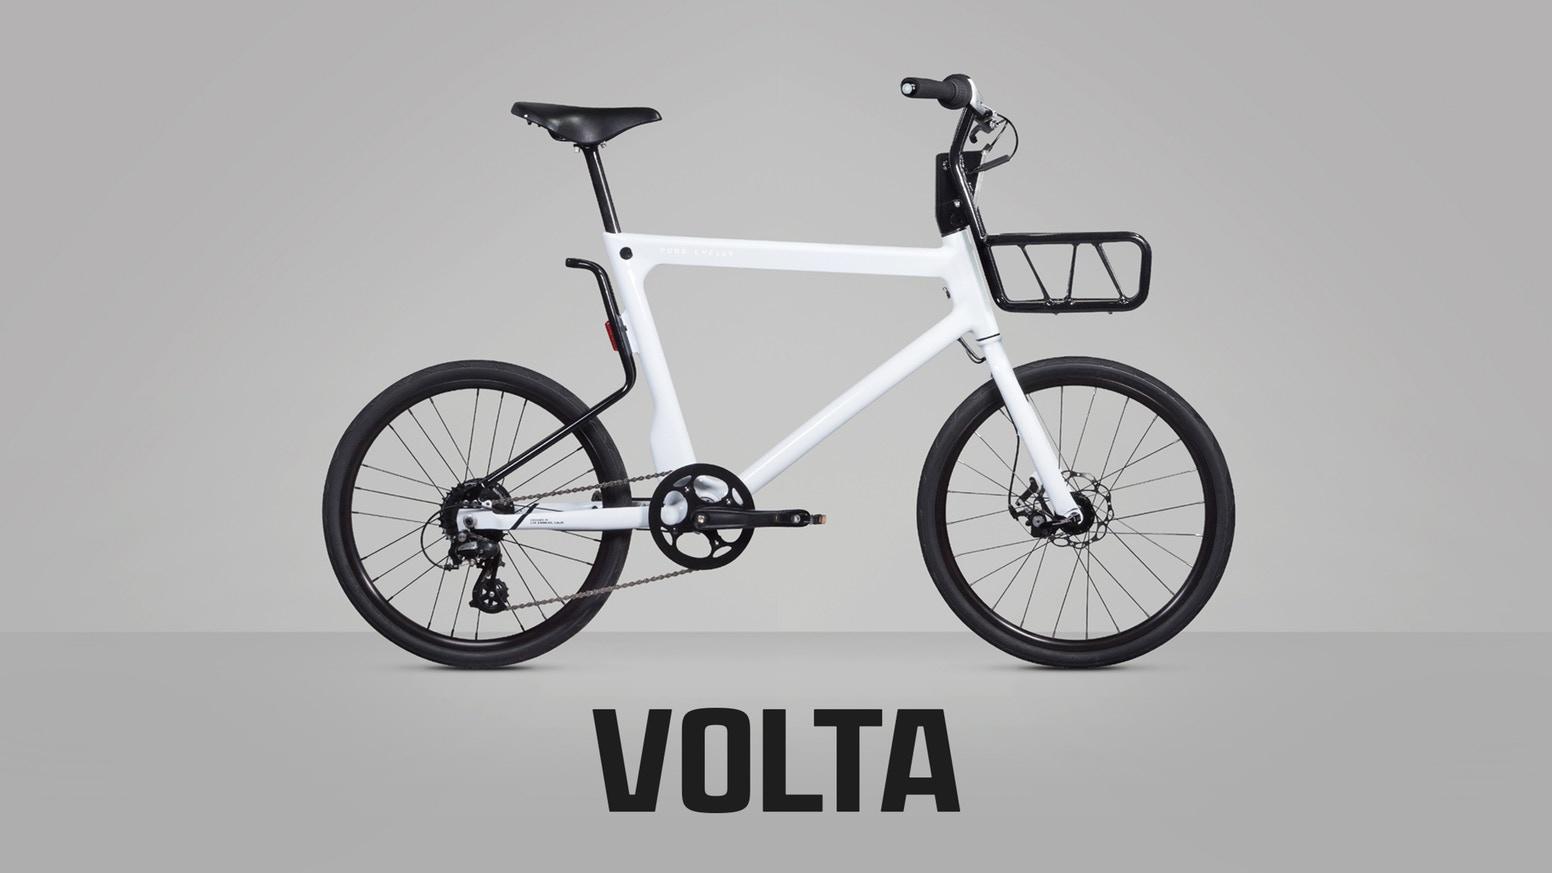 Volta Elektrische fiets